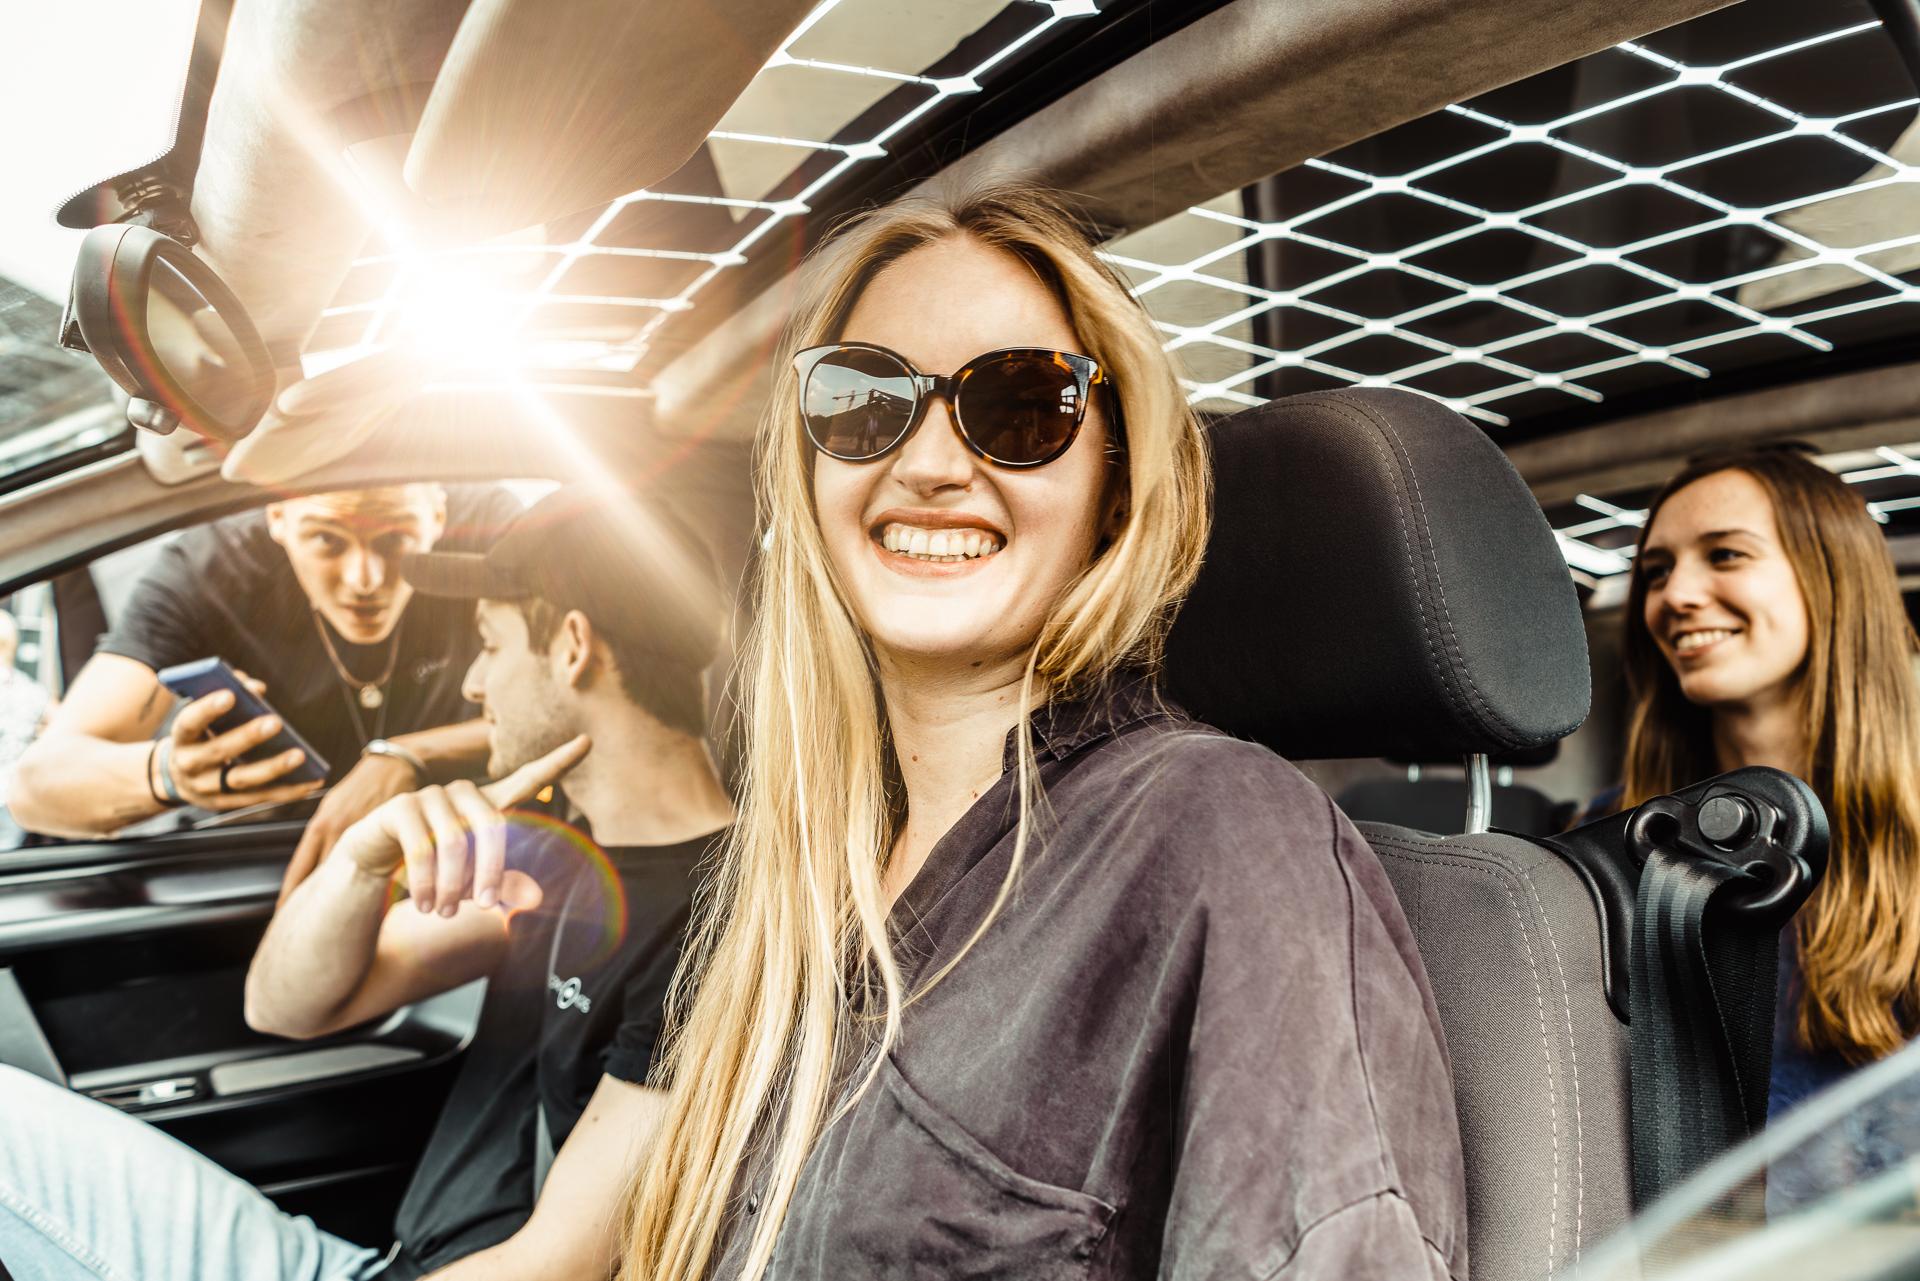 Testfahrt mit dem Sion Solarauto by Sono Motors